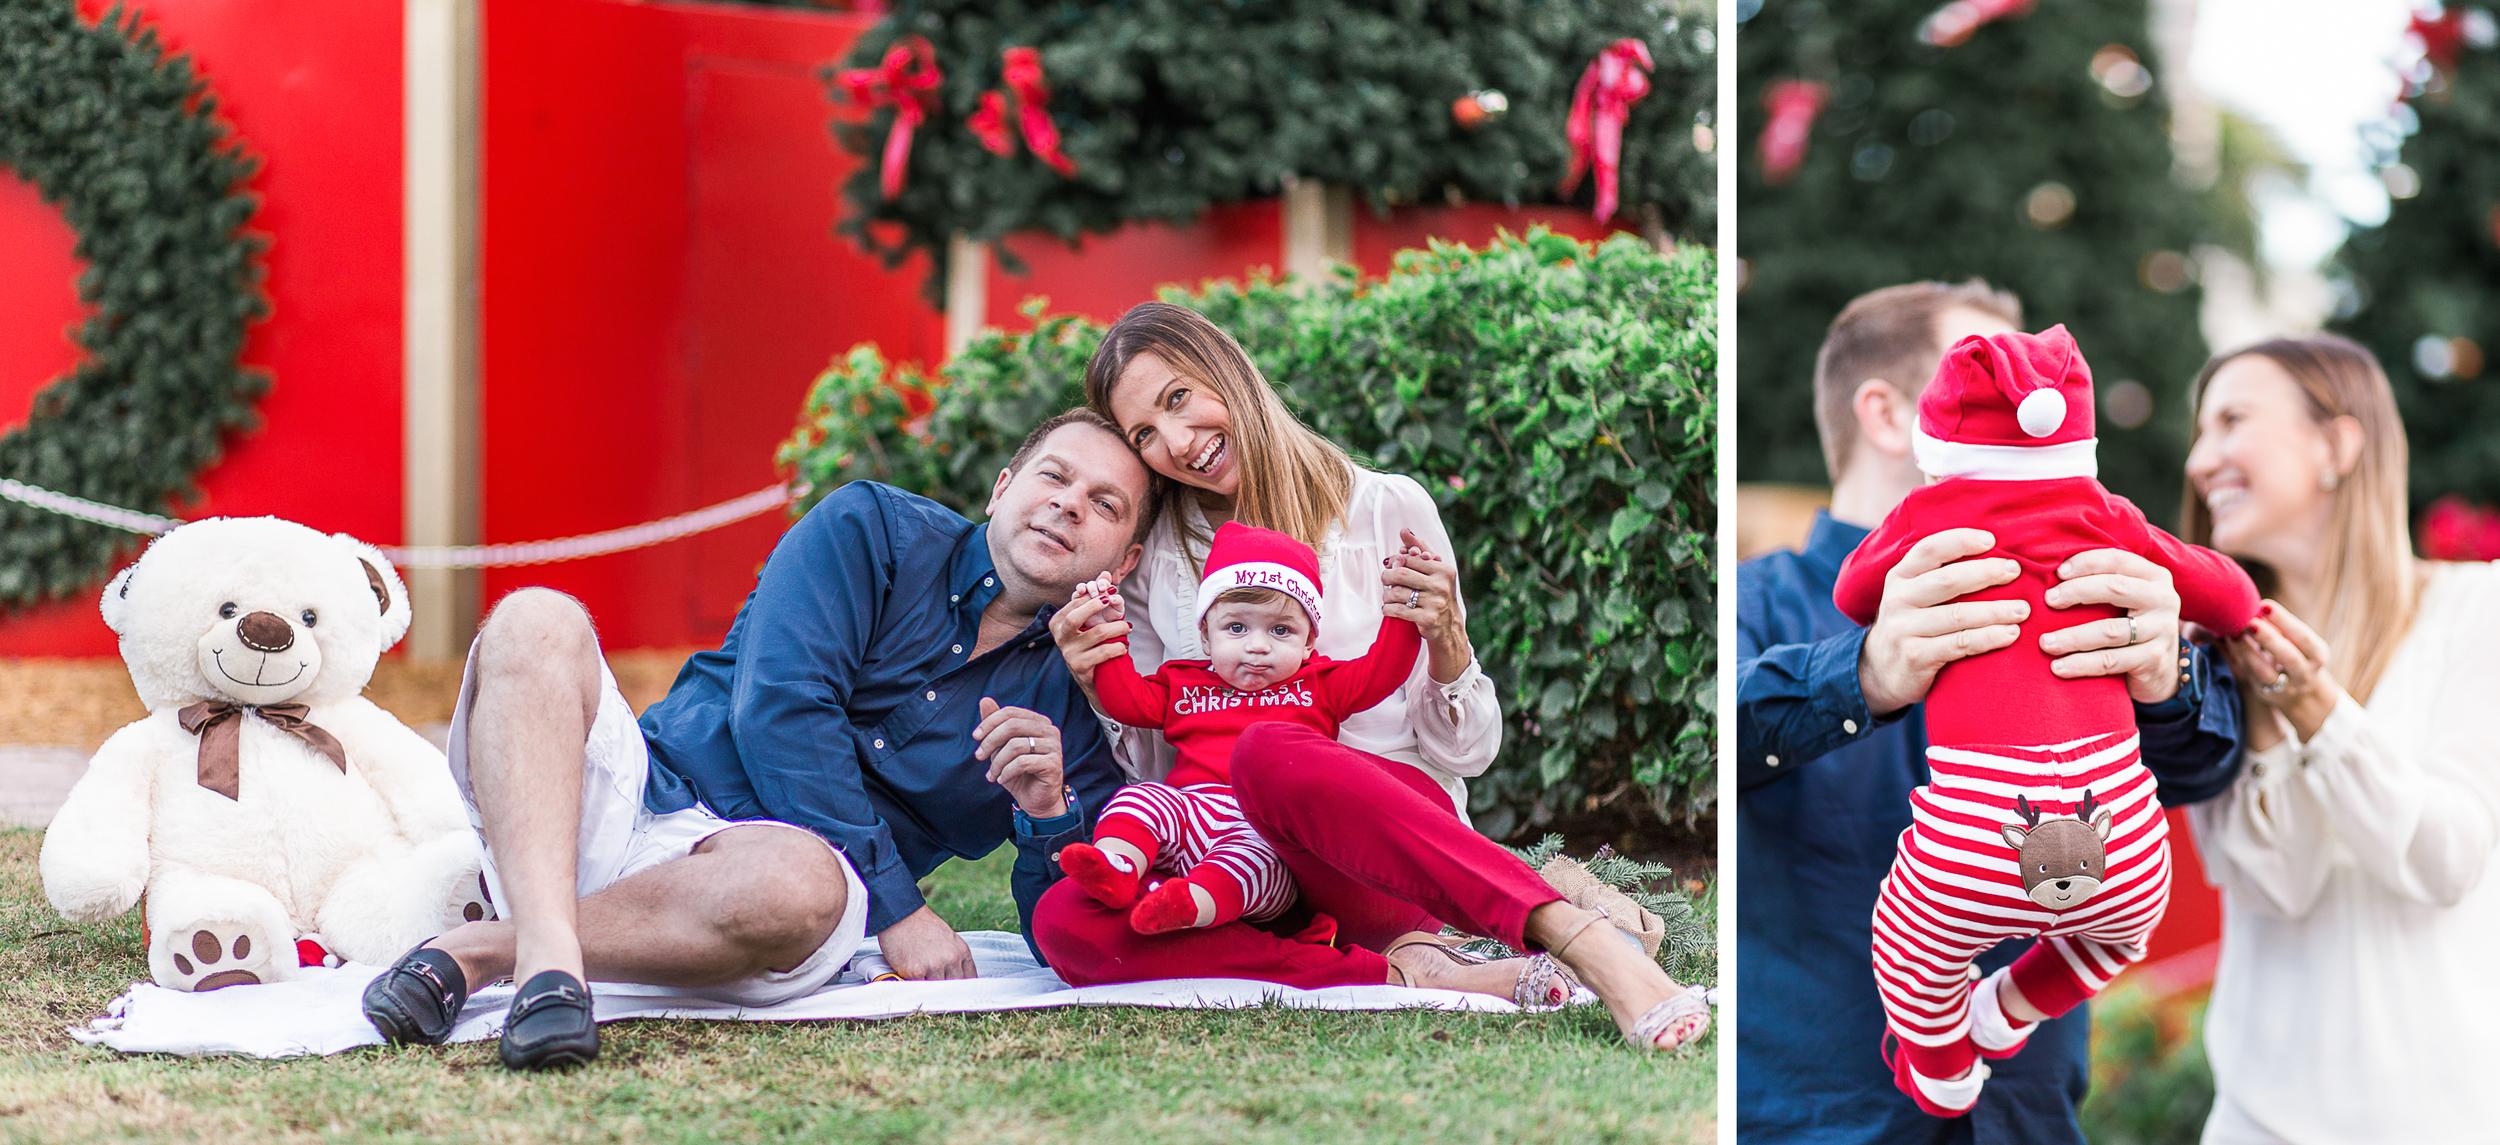 Family-Candid-Portrait-Photography-Boca-Raton-Mizner-Park-Florida